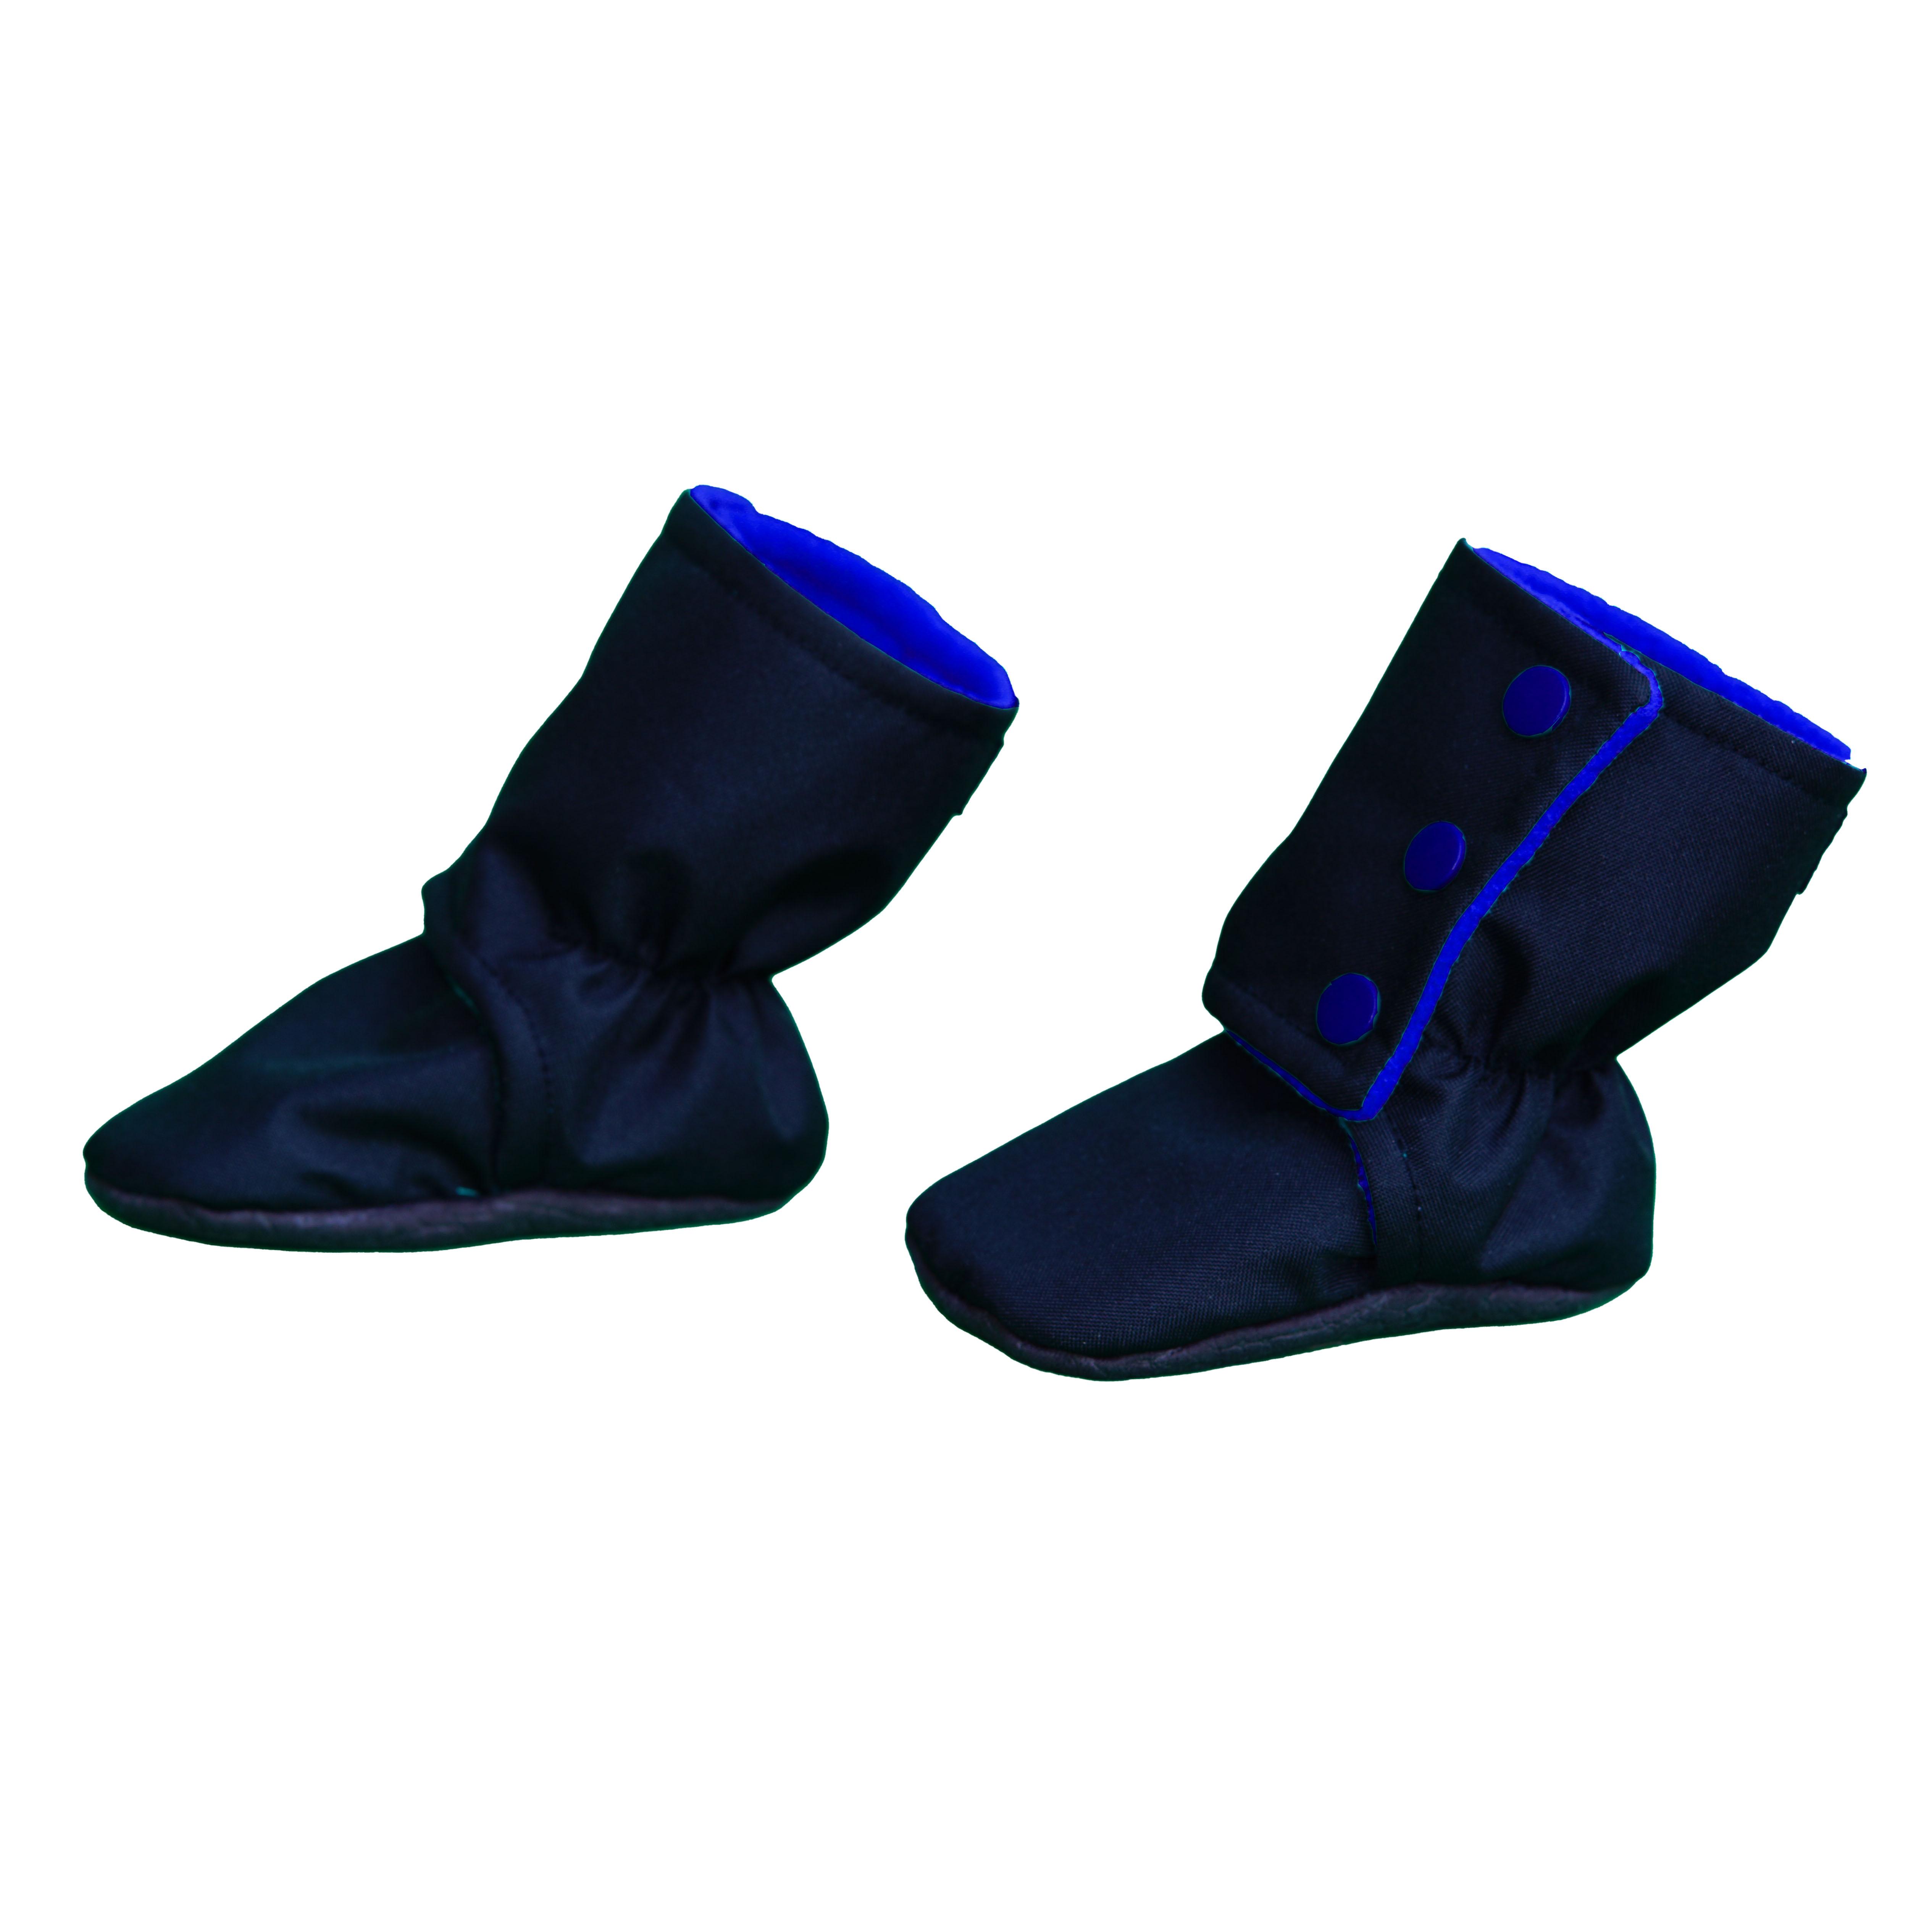 Botosei -  Negru/Albastru 3